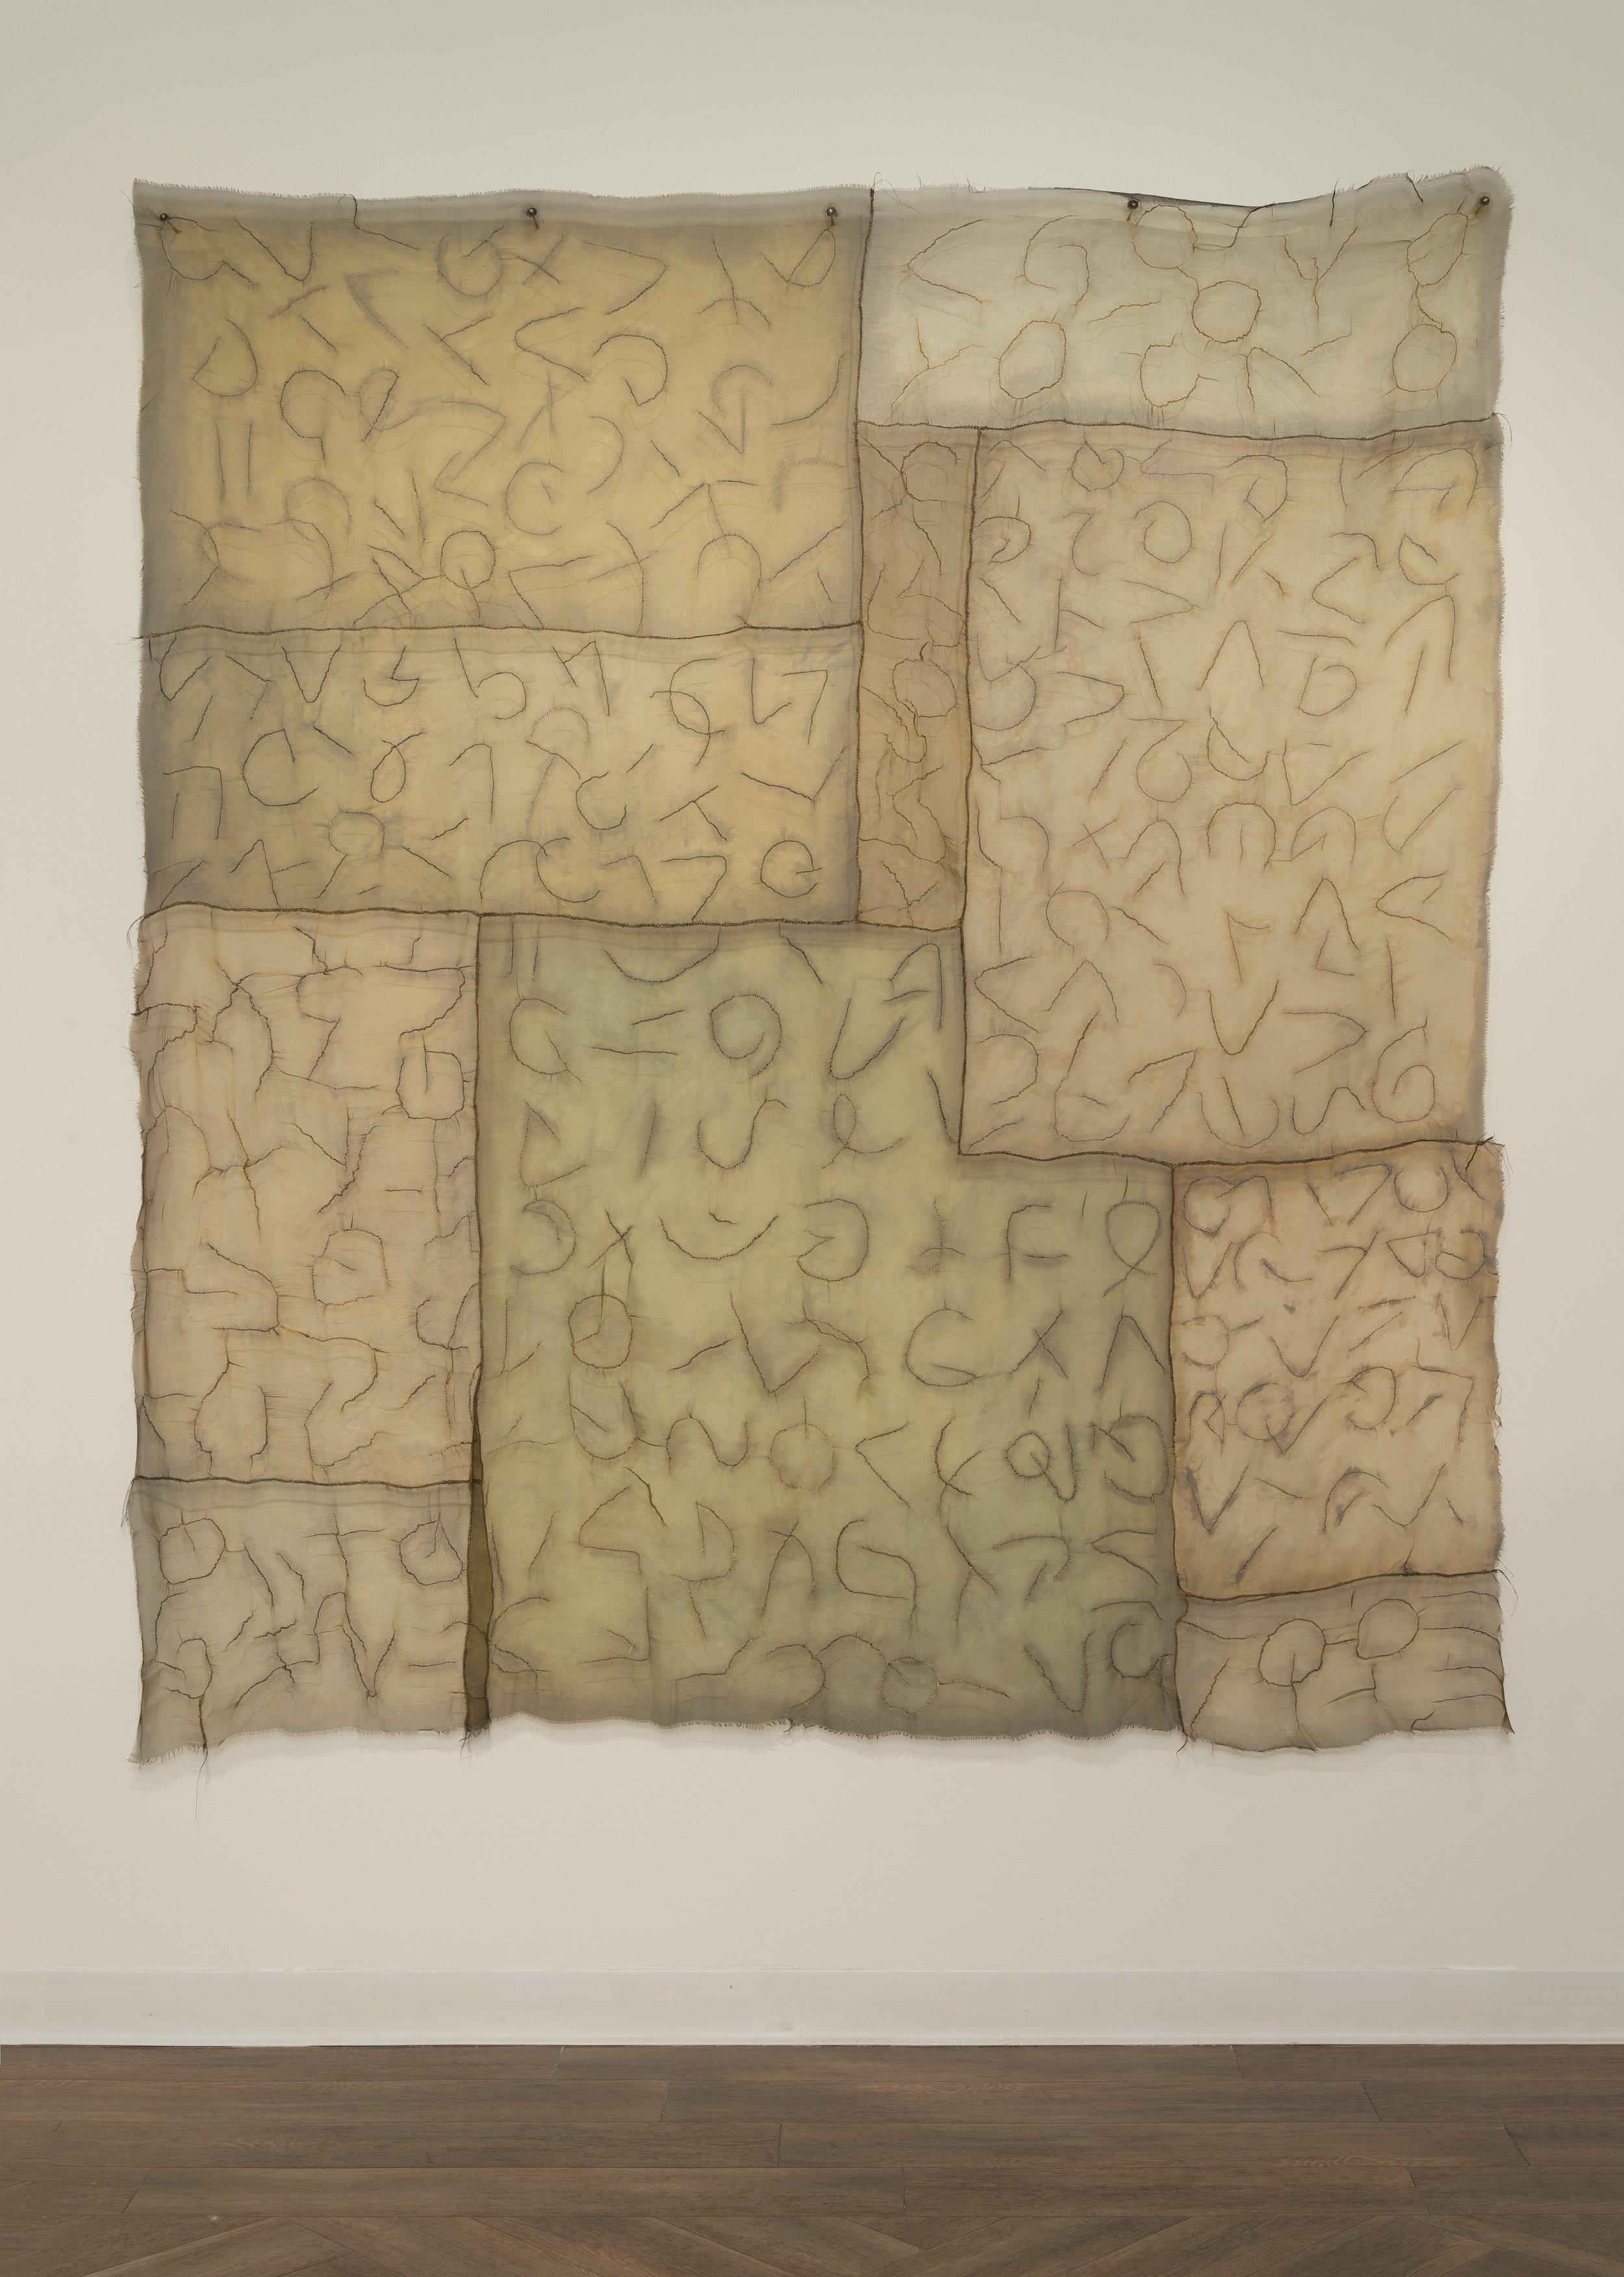 "Beneath   cotton, silk, iron oxide, thread / dyed, hand-stitched  36"" x 40"" 2002"